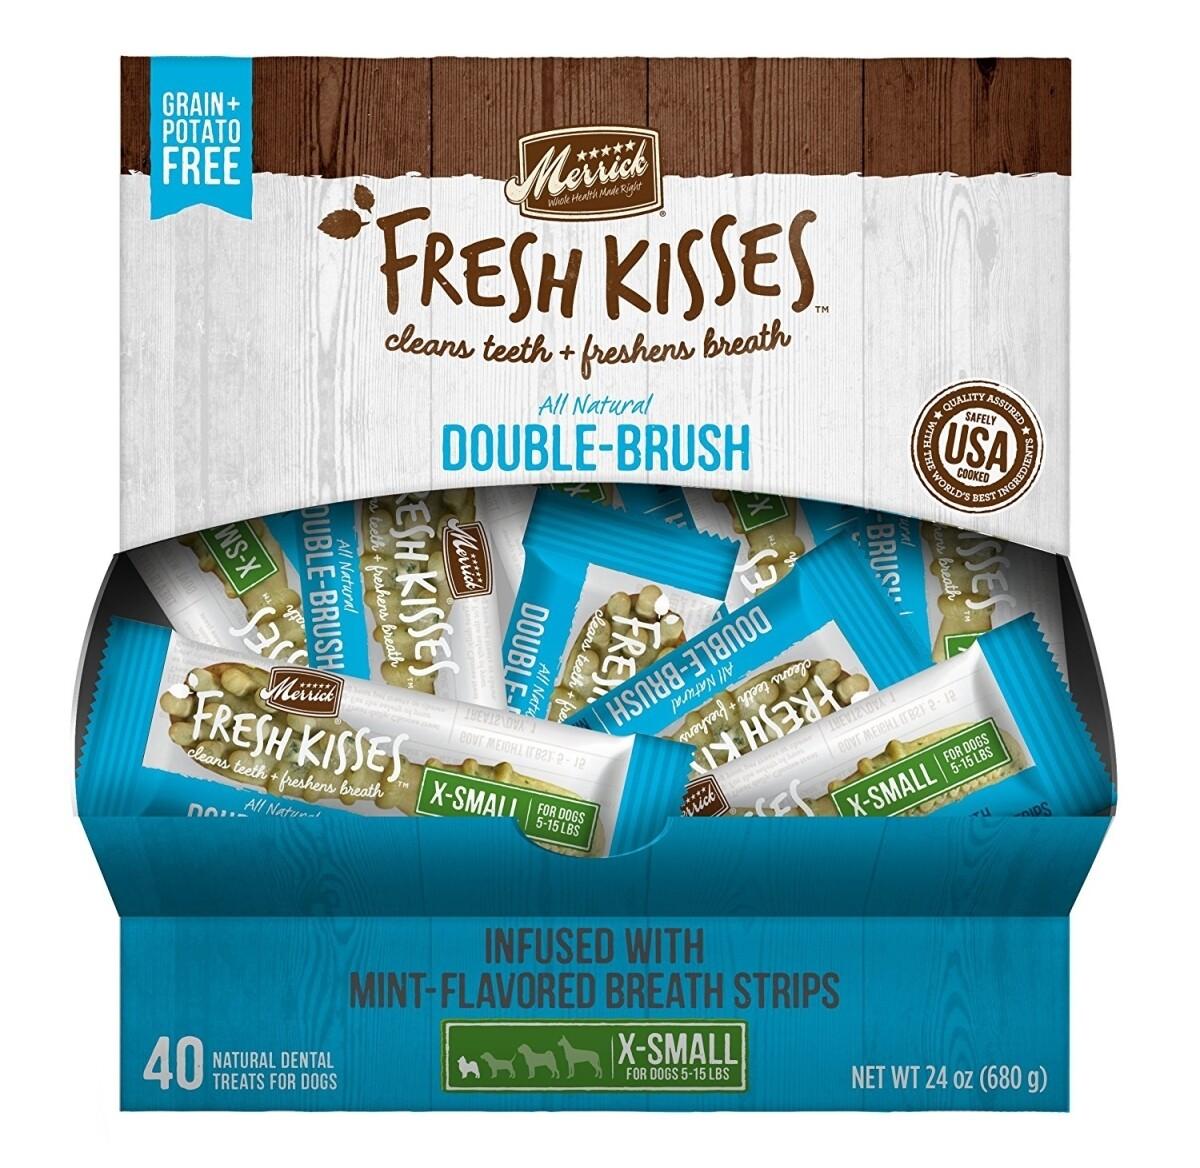 Merrick Fresh Kisses Mint Breath Strips Small Brush Dental Dog Treat - 40 Count #66036 (03/19) (A.K5/DT)